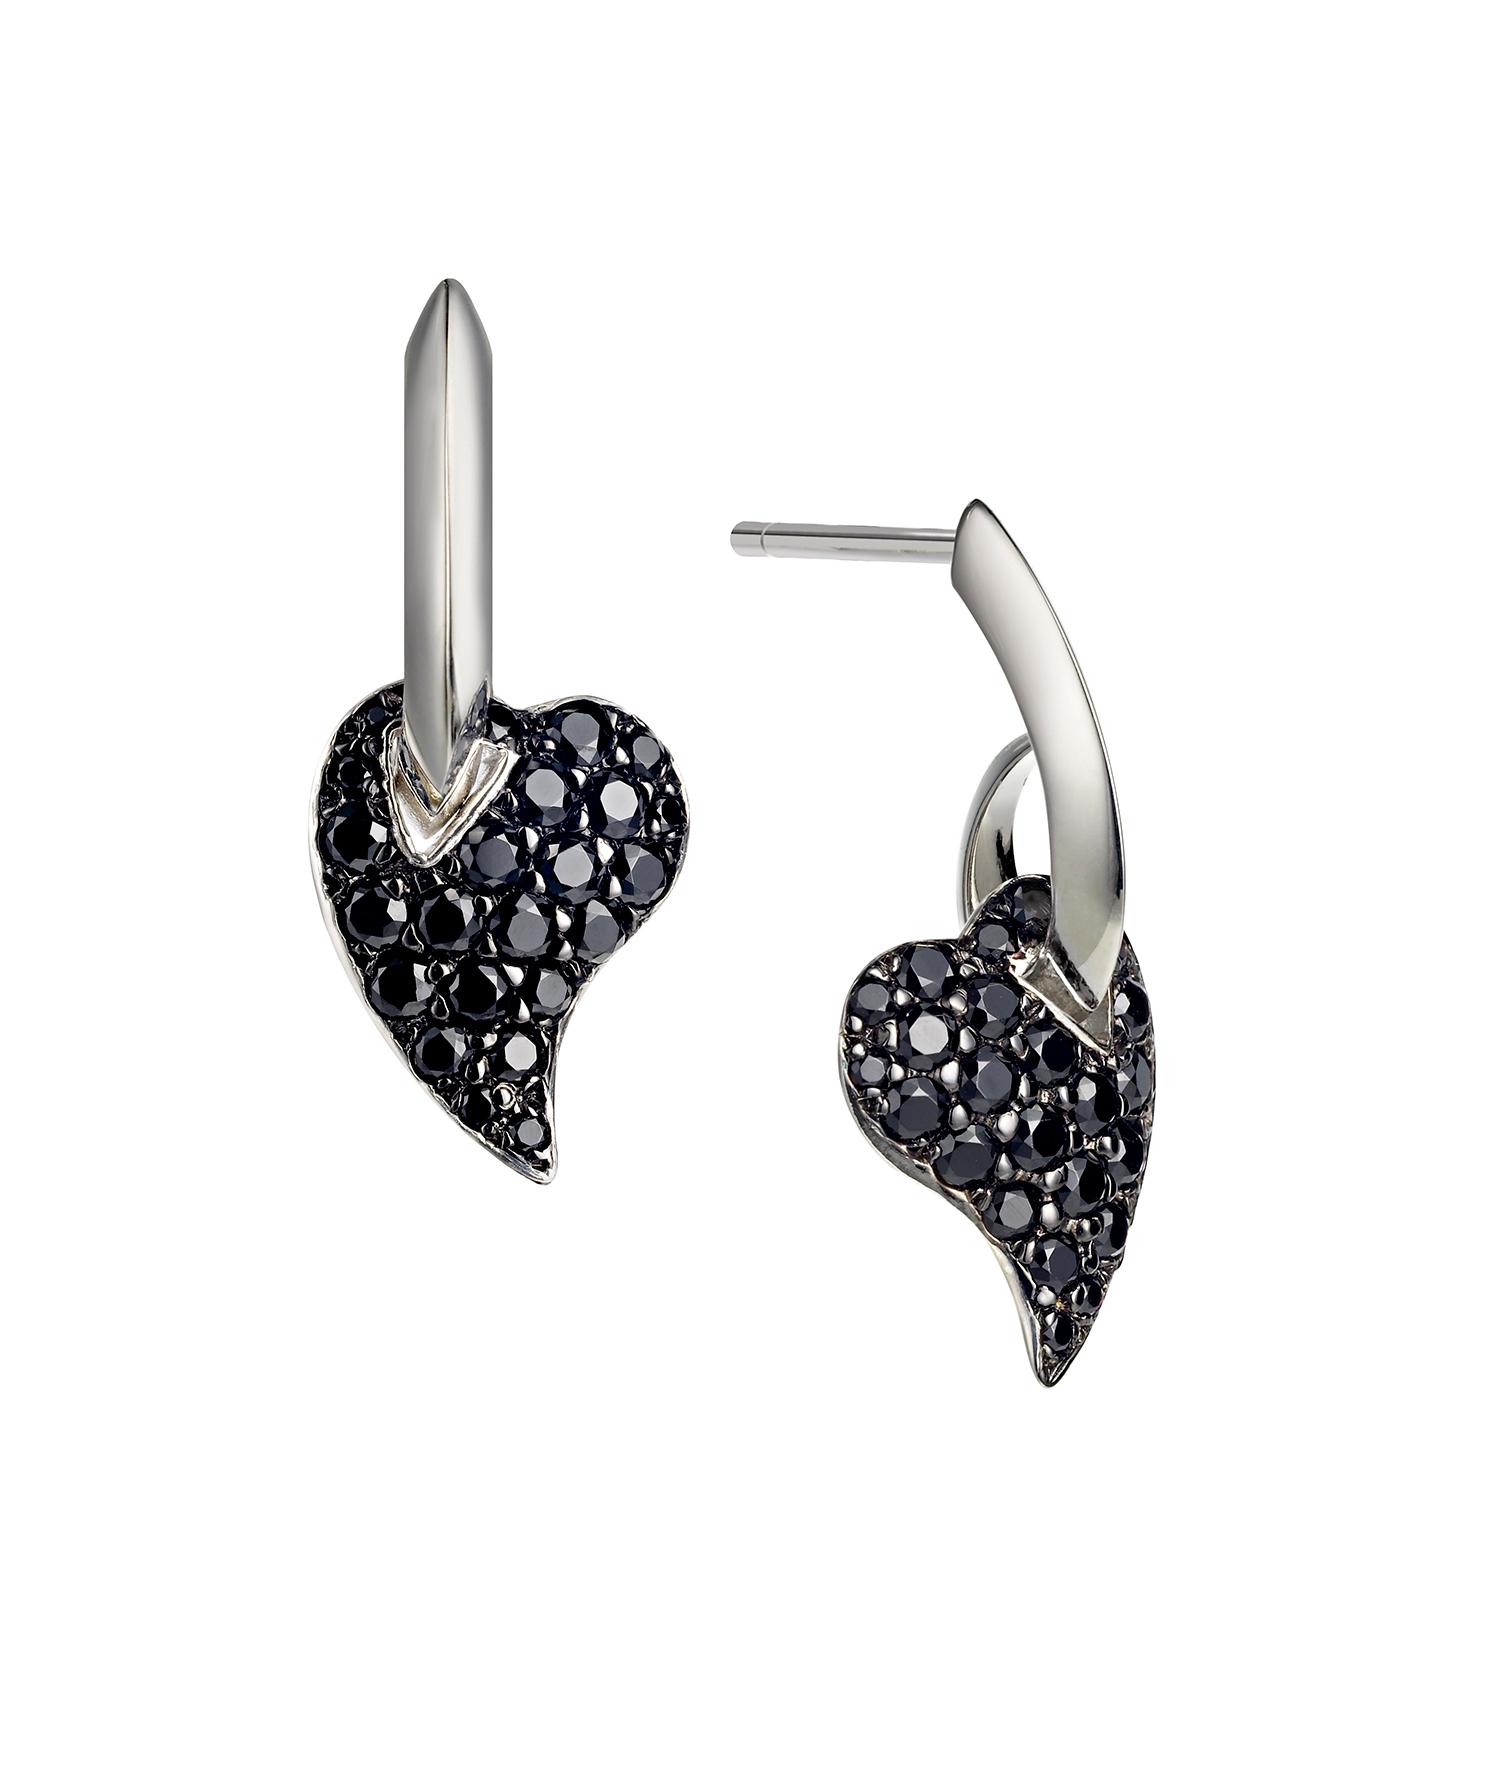 heart-shaped earrings set with black gemstones